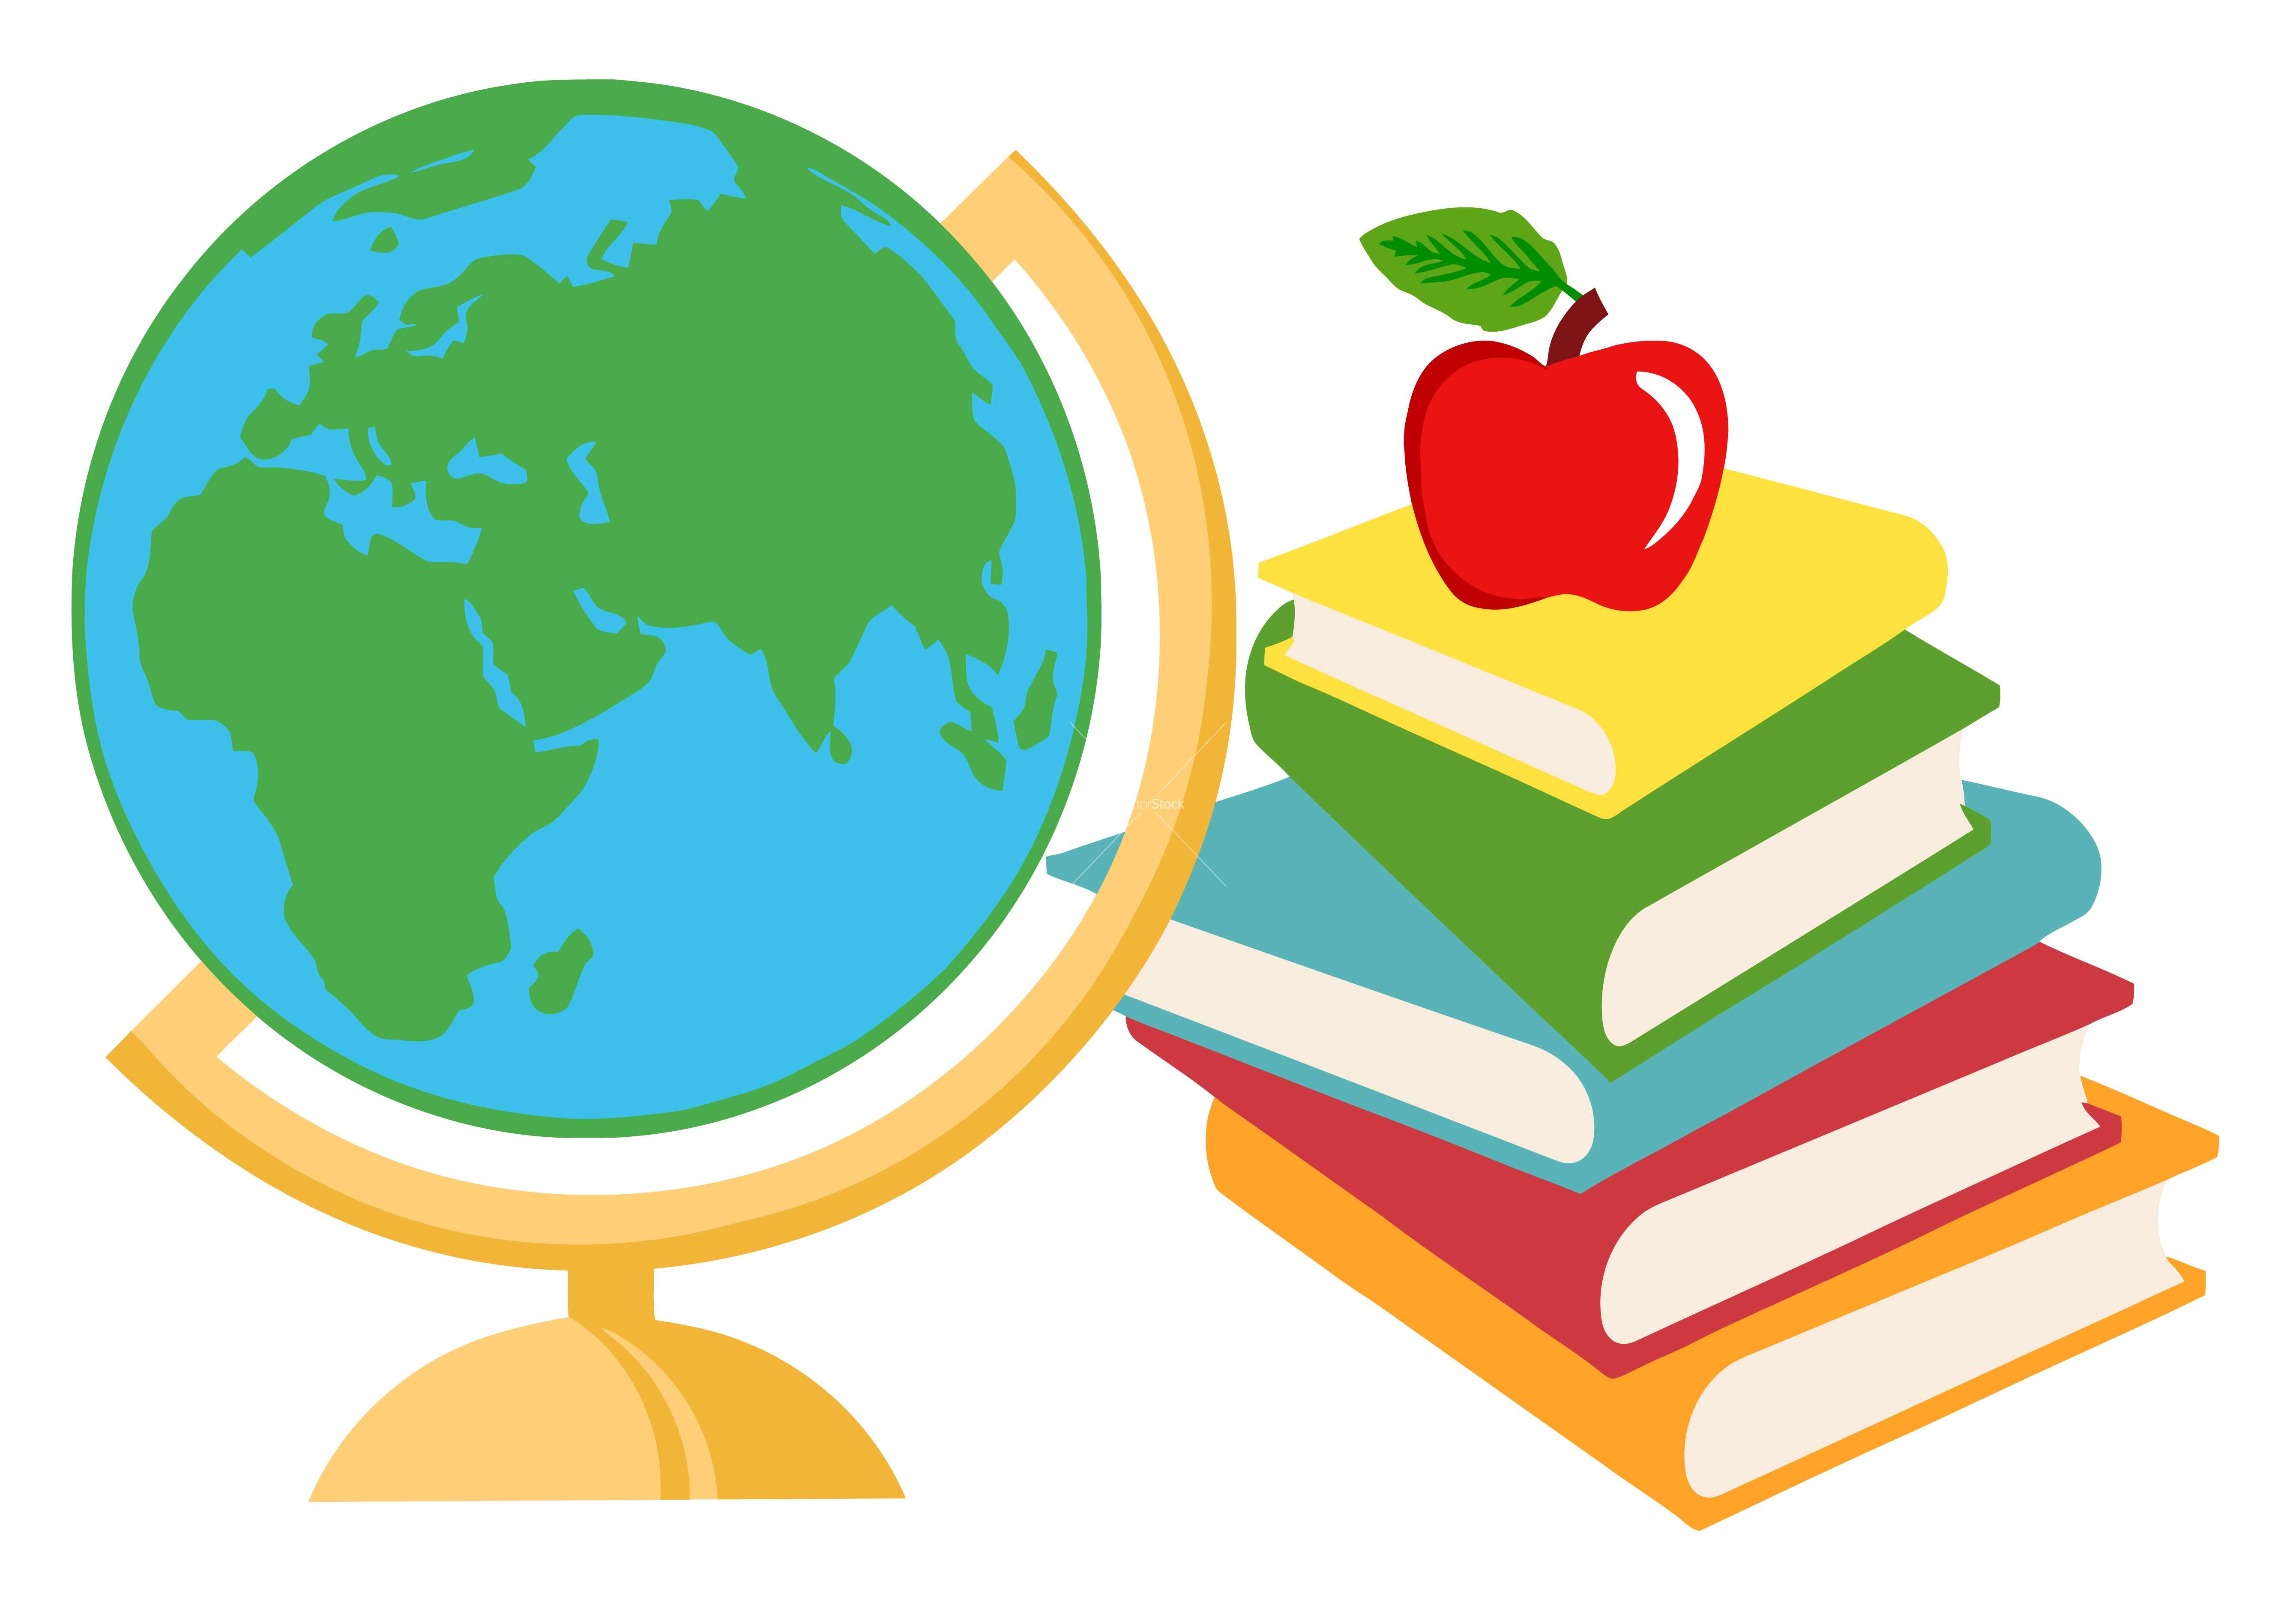 Geography clipart school. Classroom books cartoon station